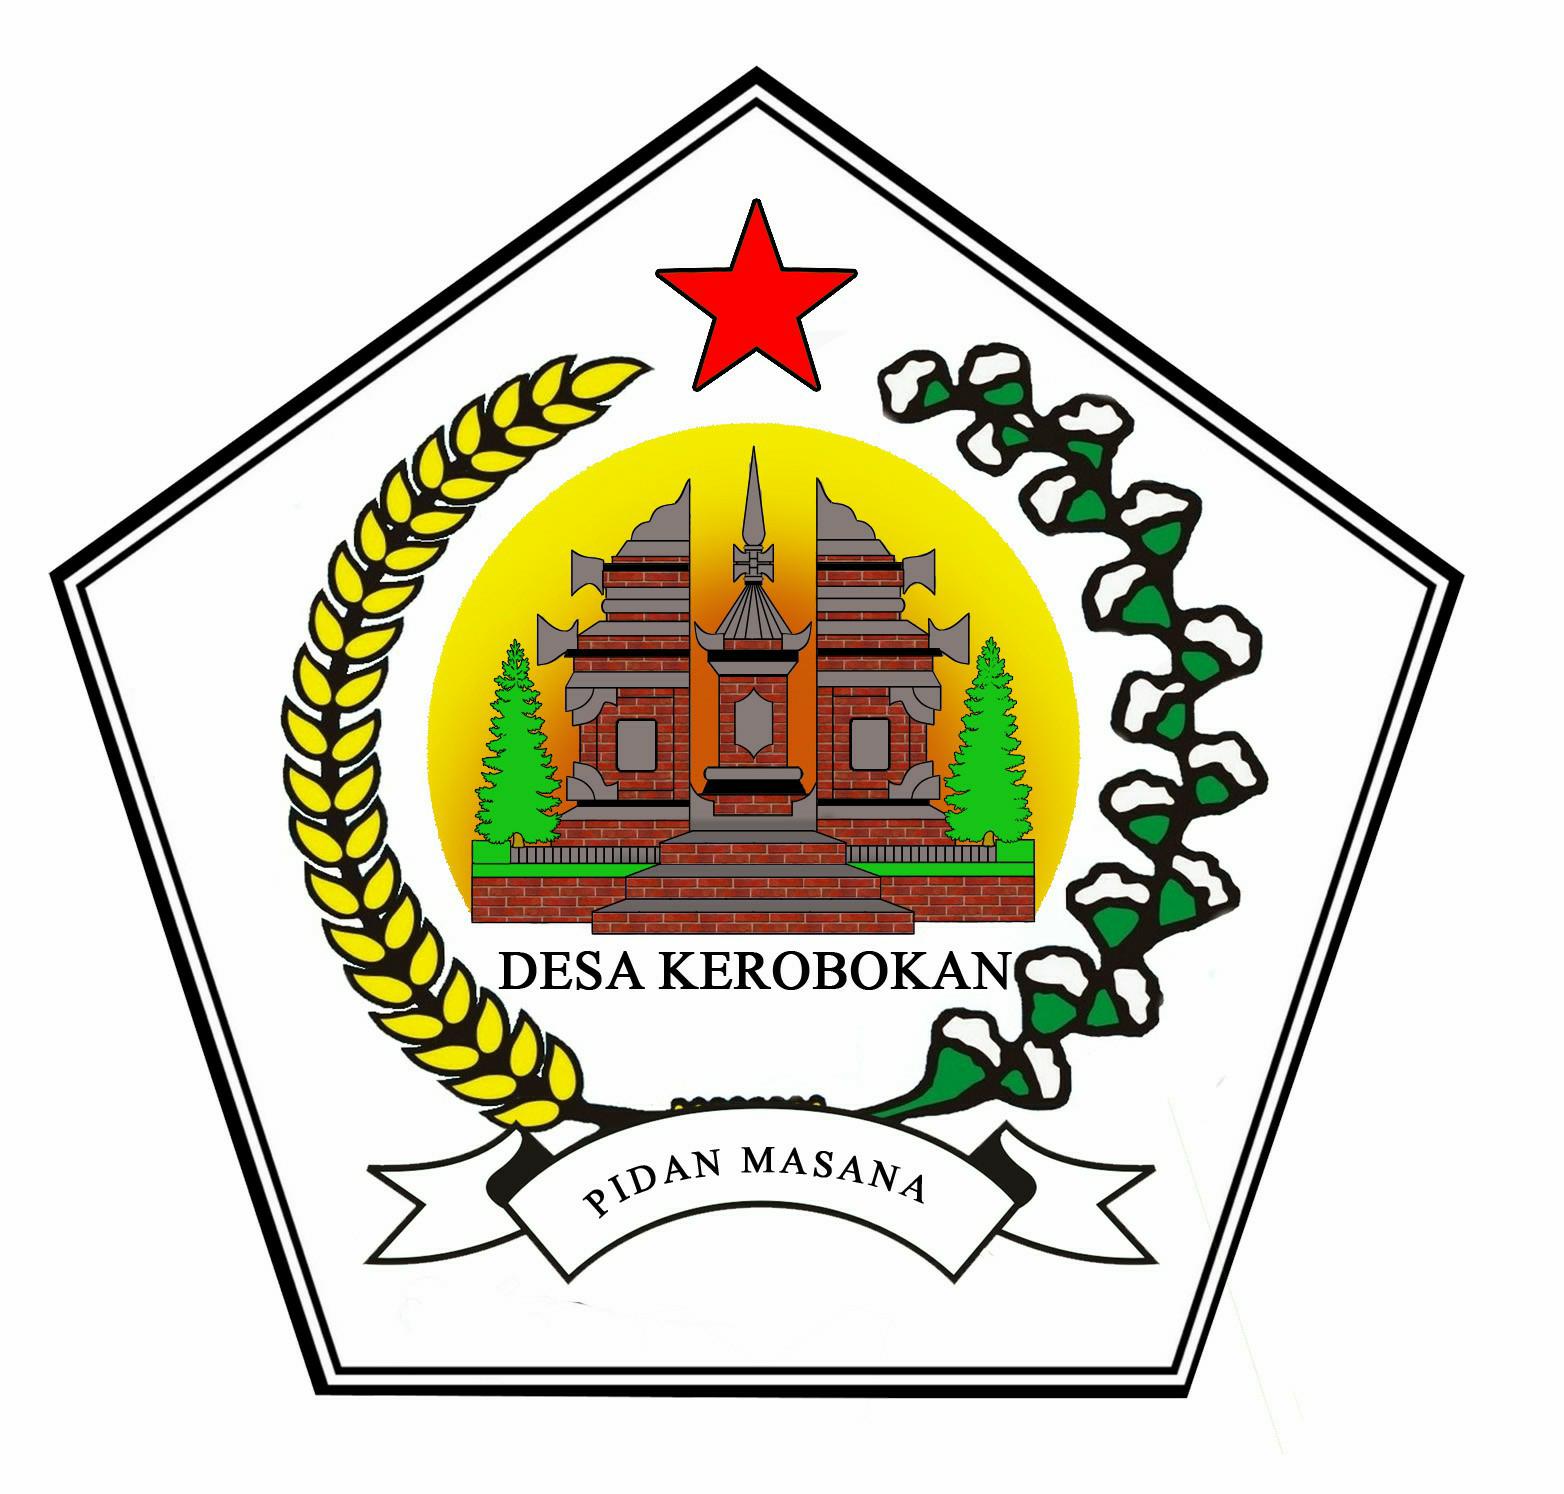 KEROBOKAN